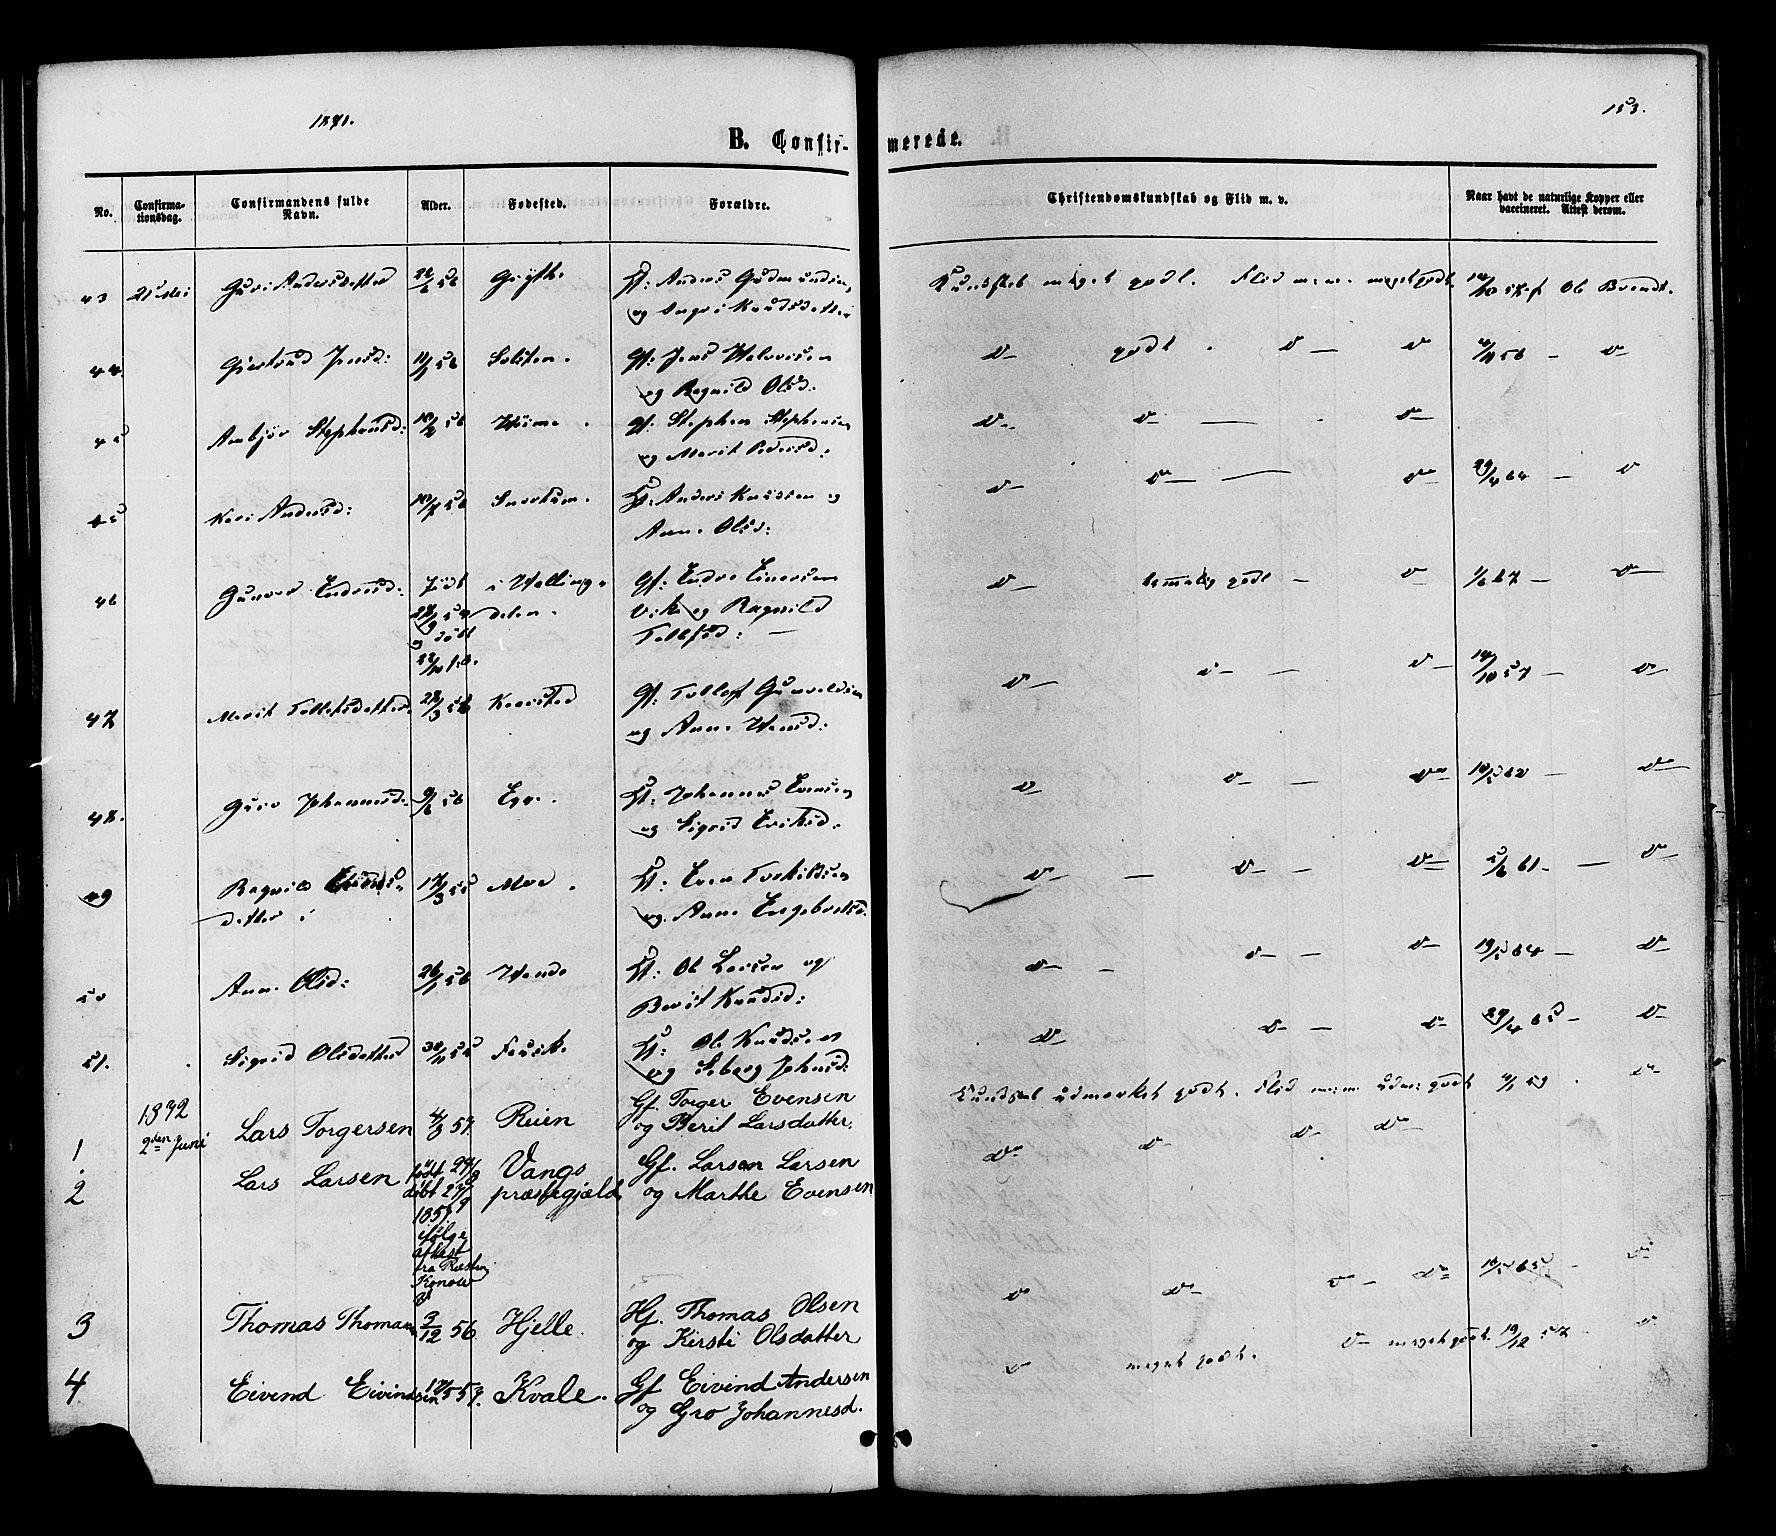 SAH, Vestre Slidre prestekontor, Ministerialbok nr. 3, 1865-1880, s. 153